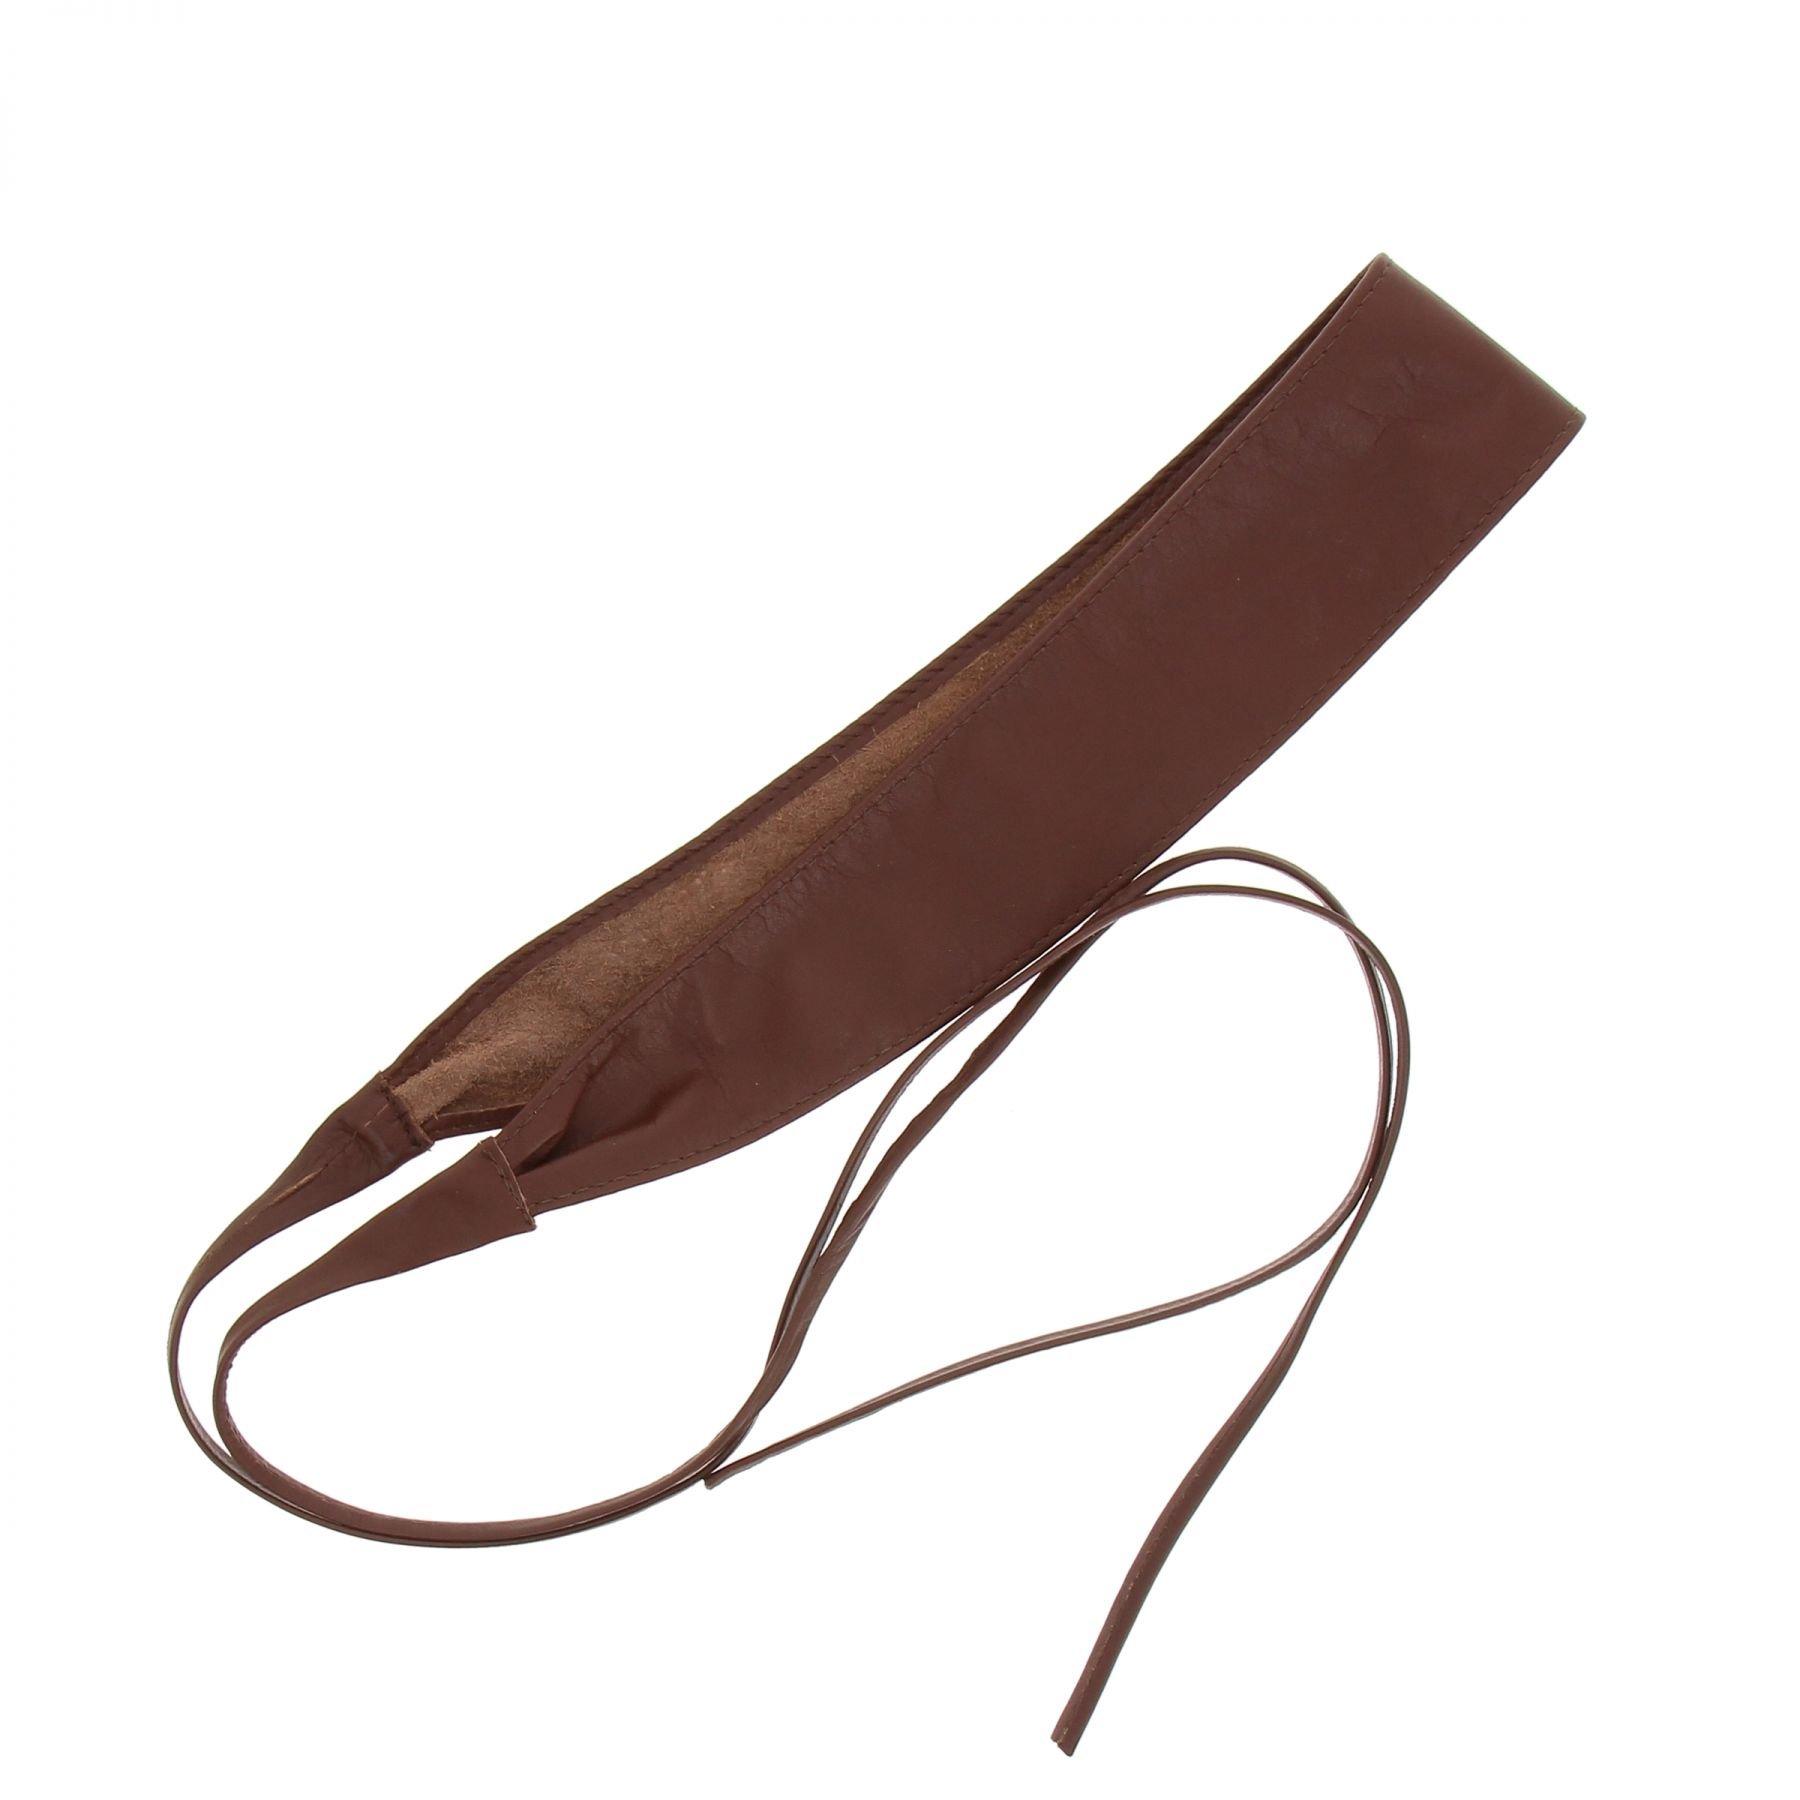 FASHIONGEN - Woman Italian leather Obi belt, CASSIANE - Brown, L-XL